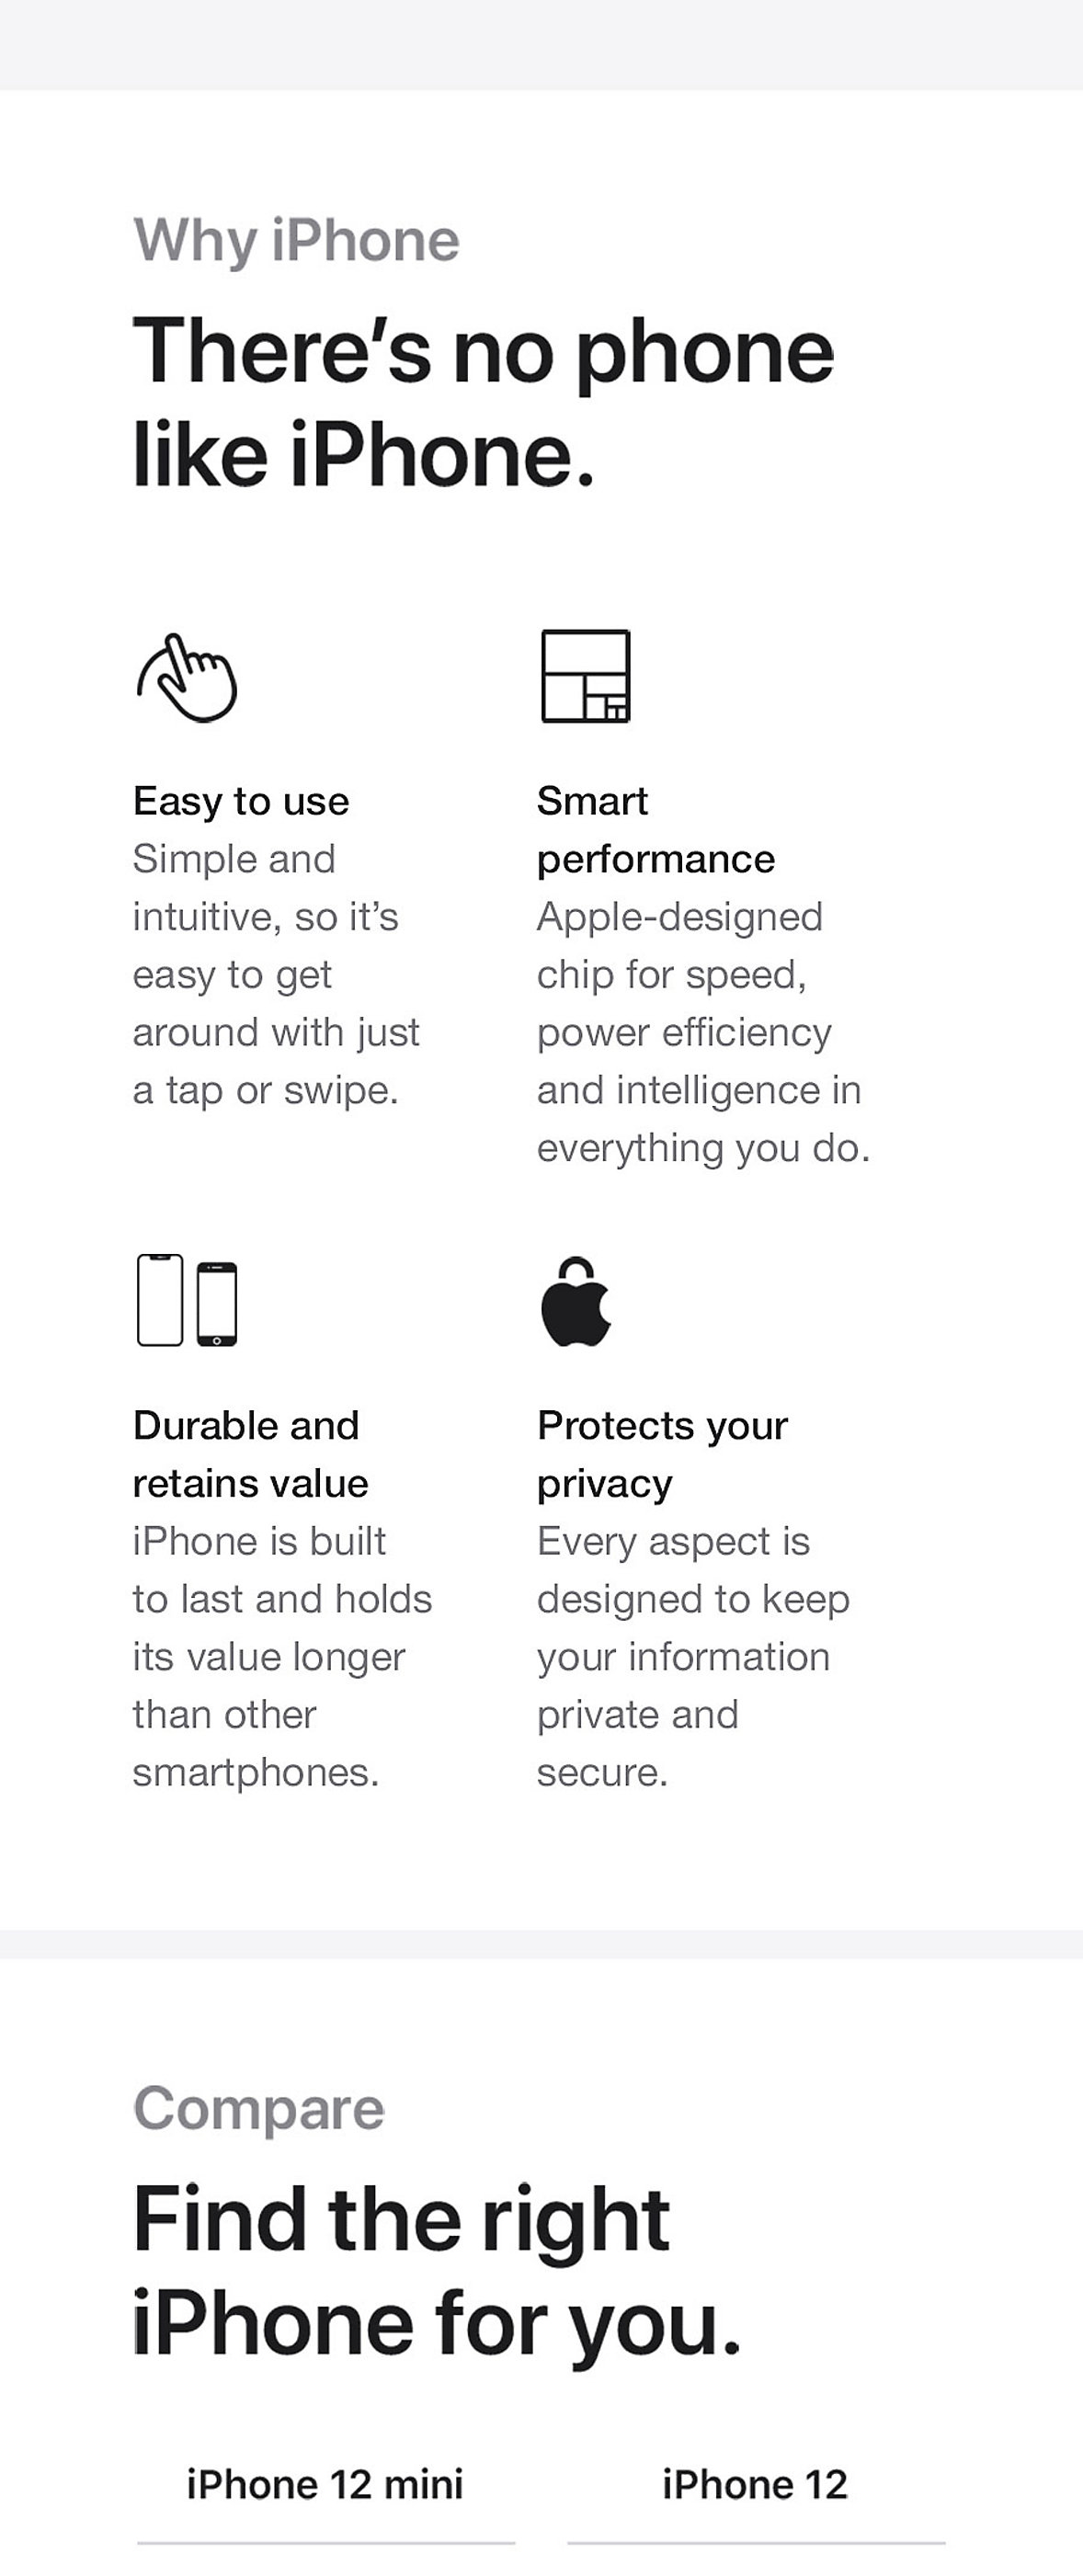 Compare Apple iPhone 12